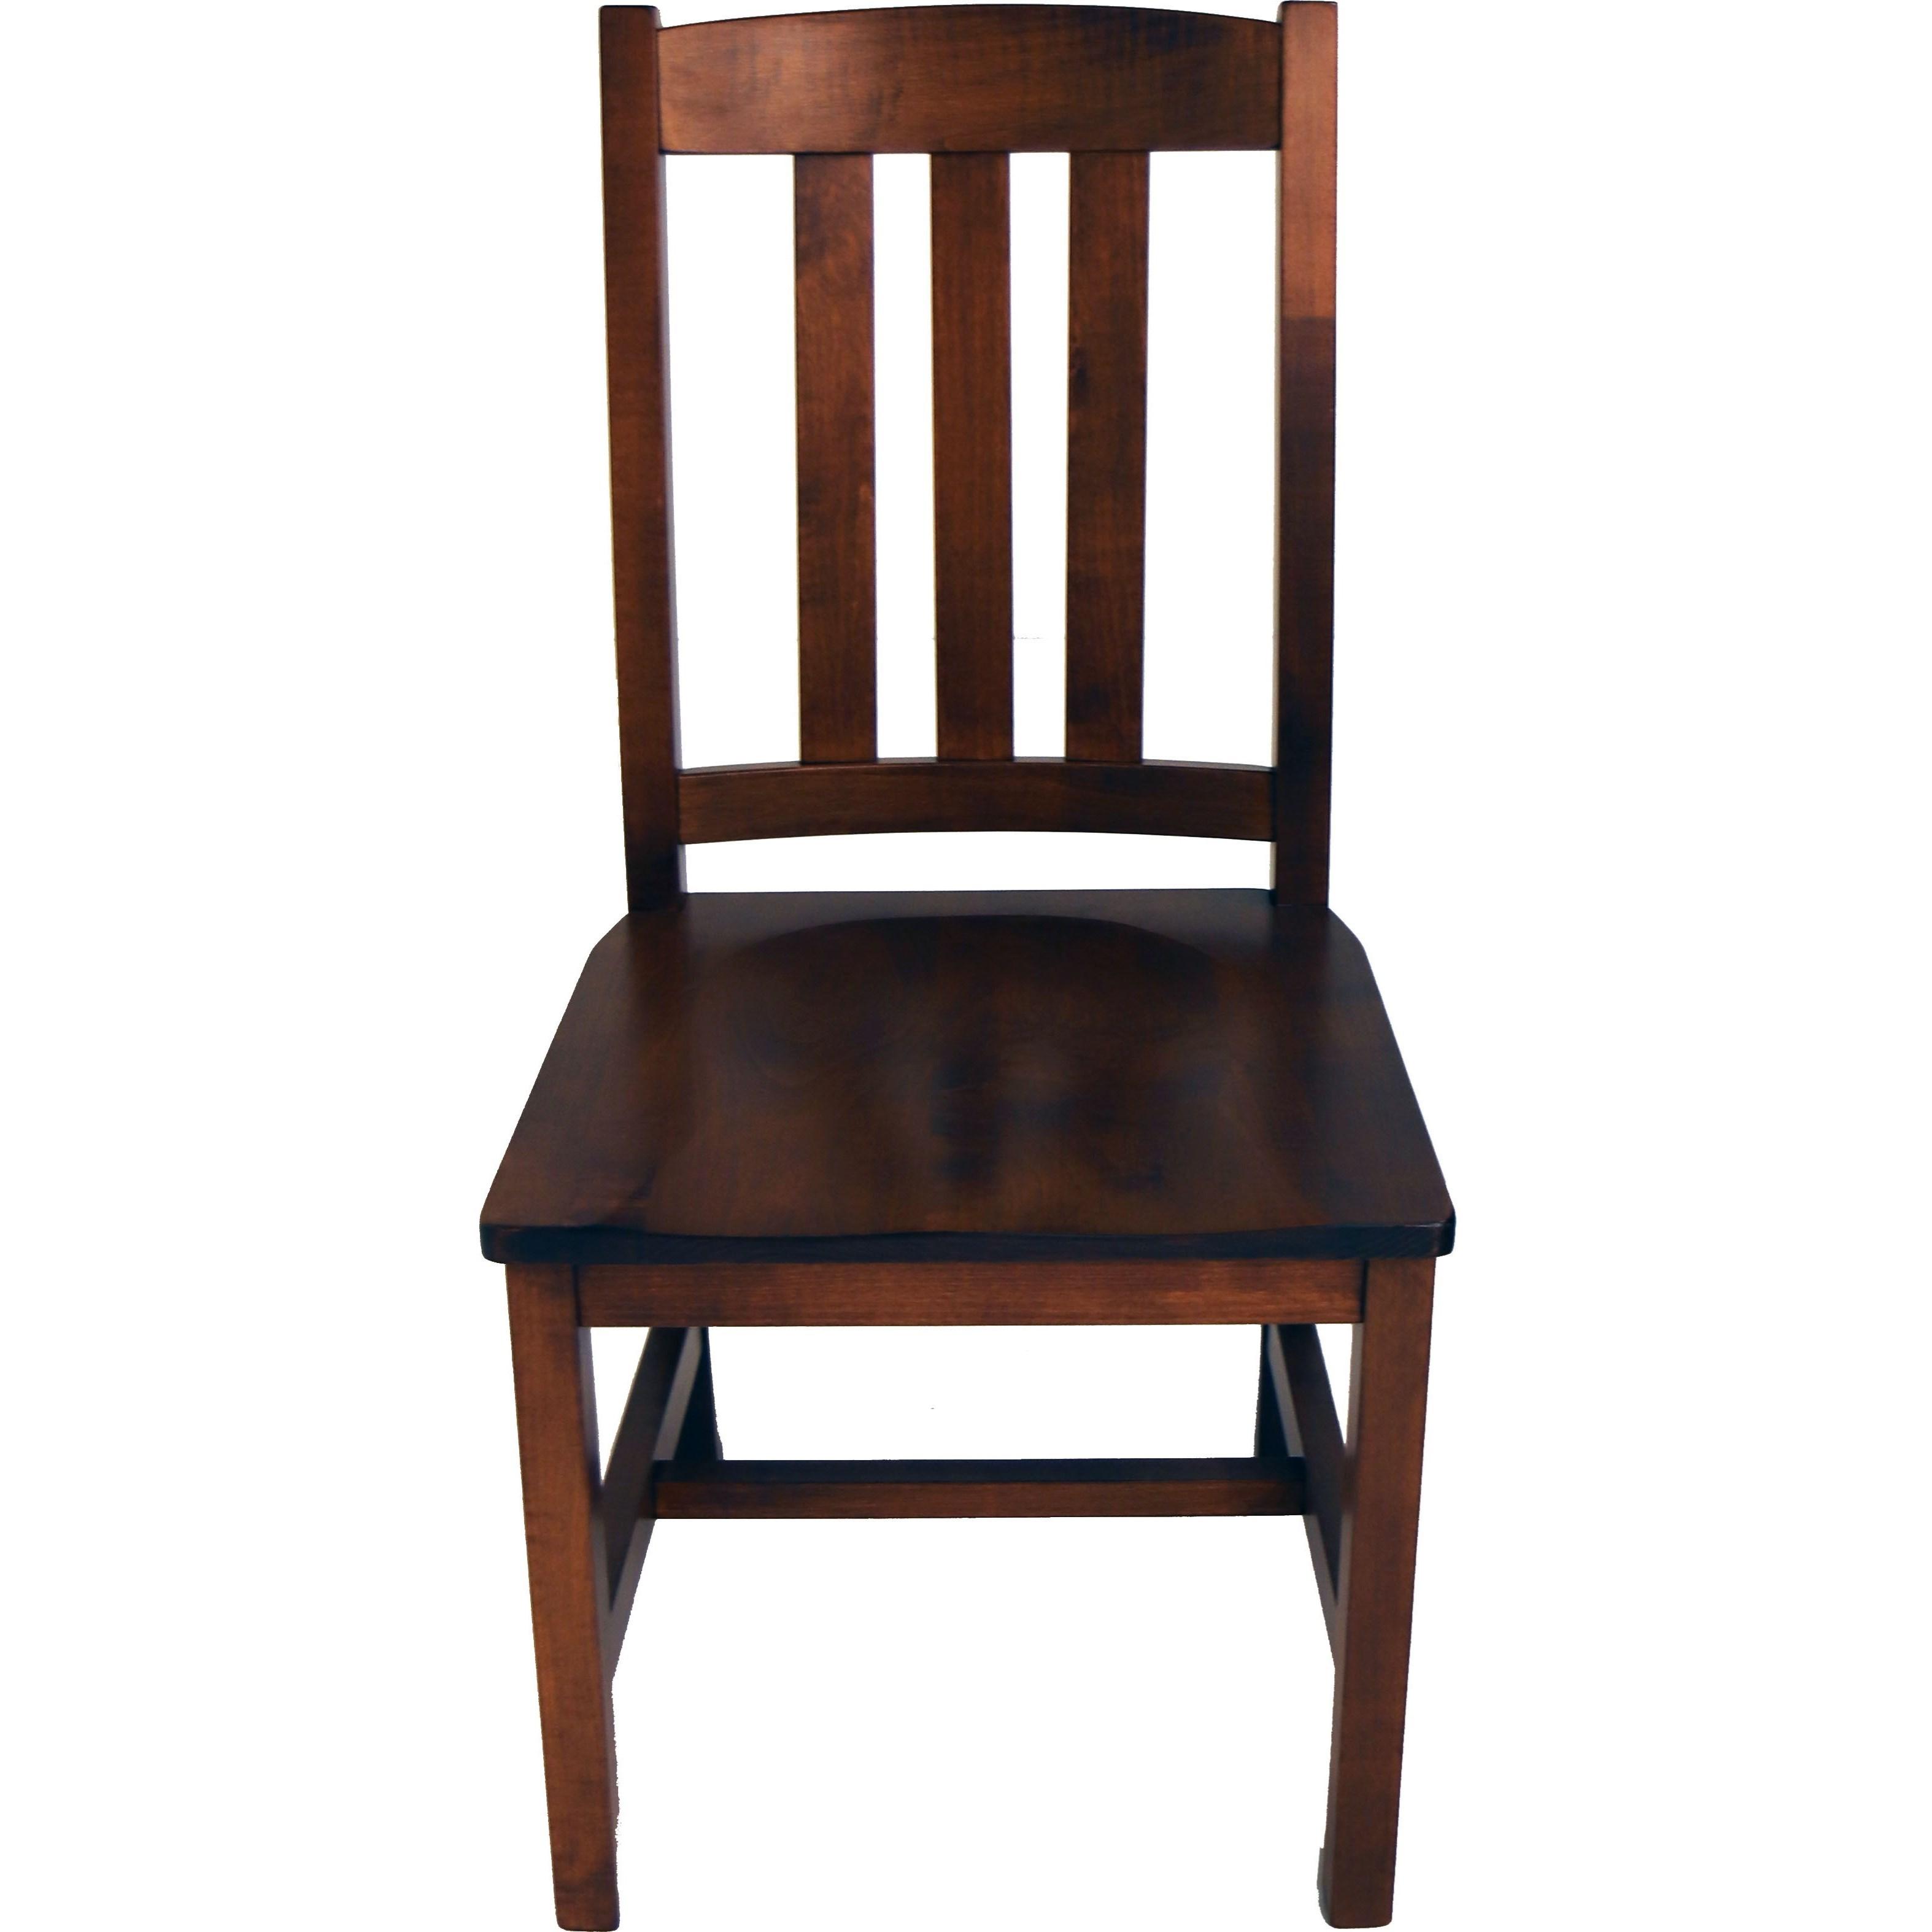 Amish Essentials Cooper Chair by Archbold Furniture at Mueller Furniture